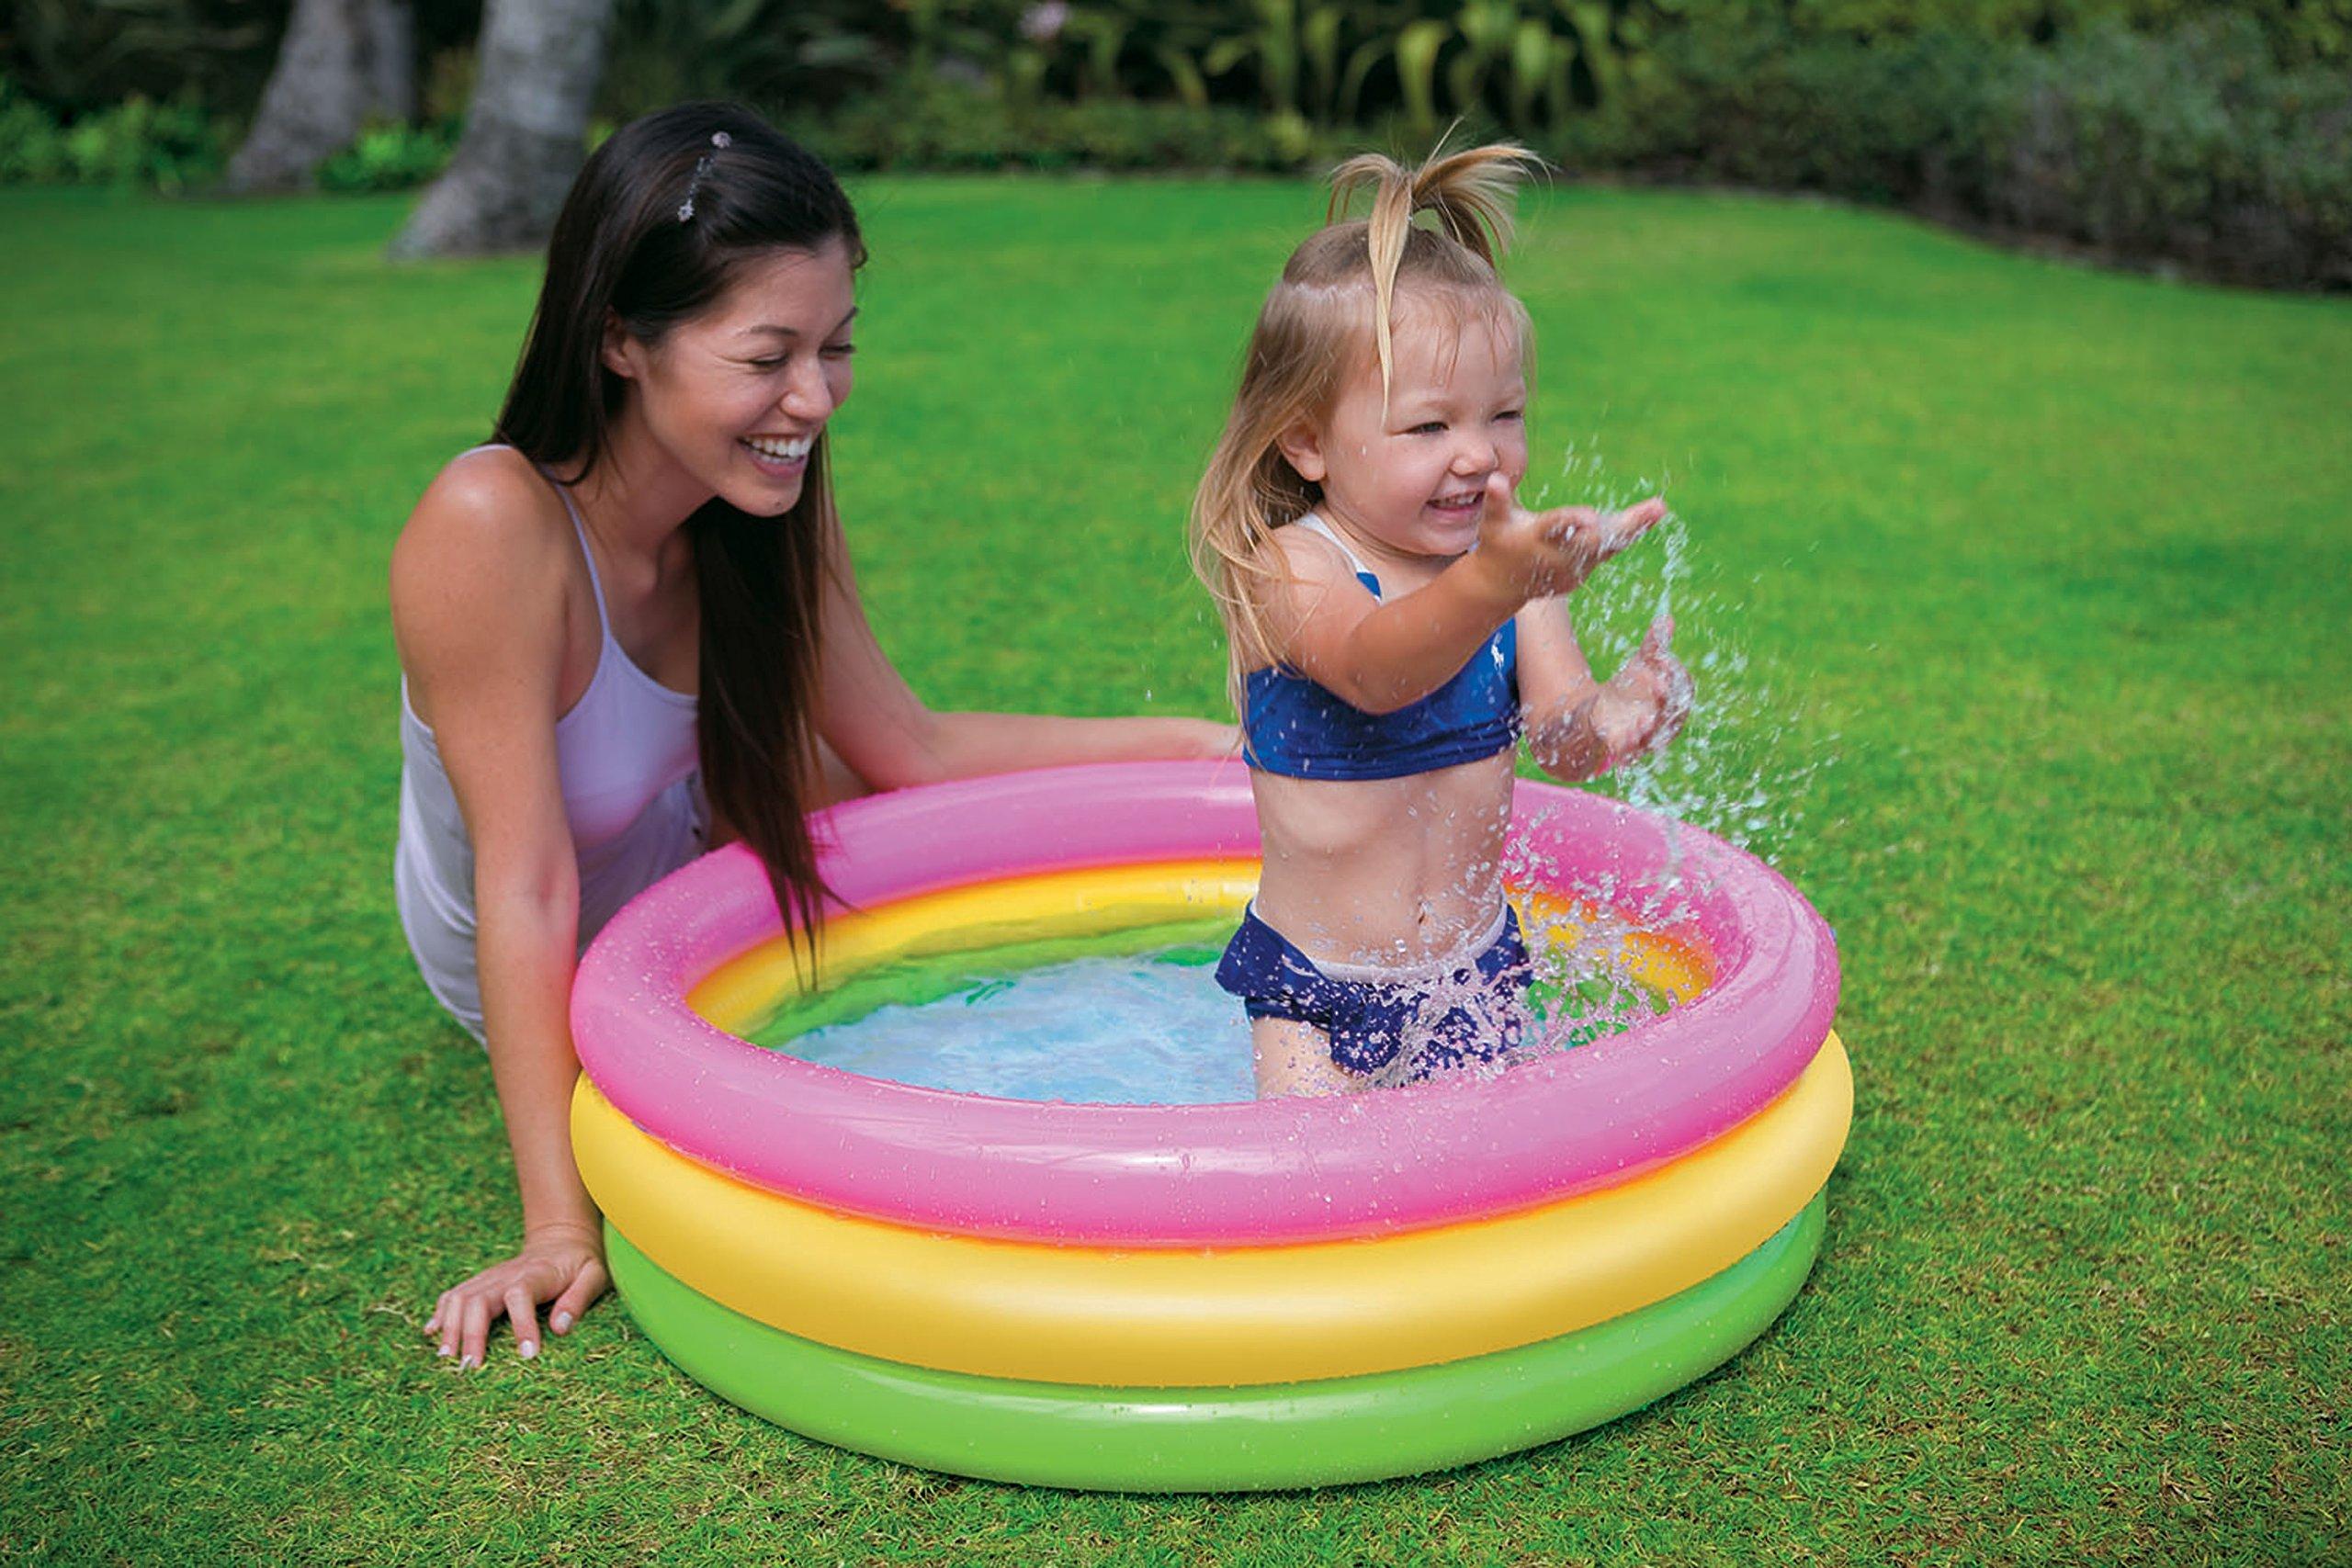 Buy Sunset Glow Baby Pool Now!